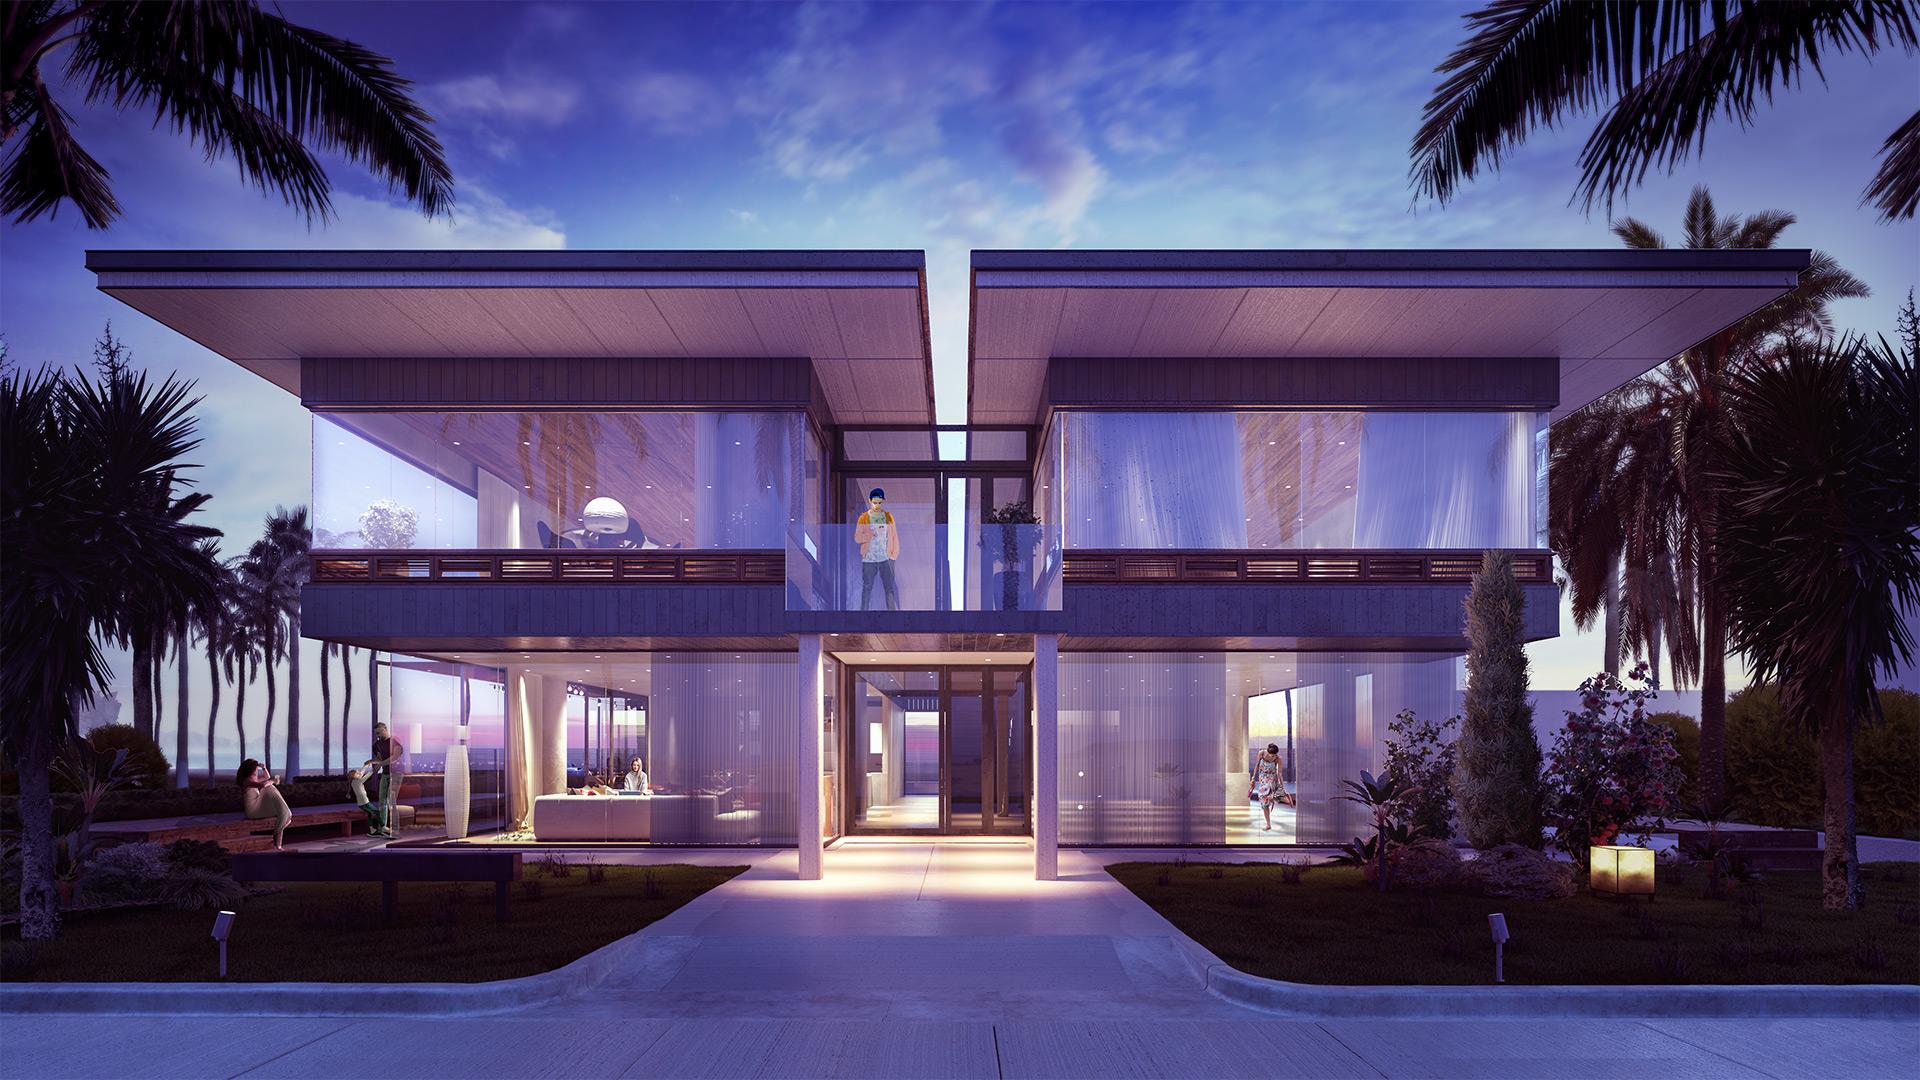 Residential Beach front property villa render